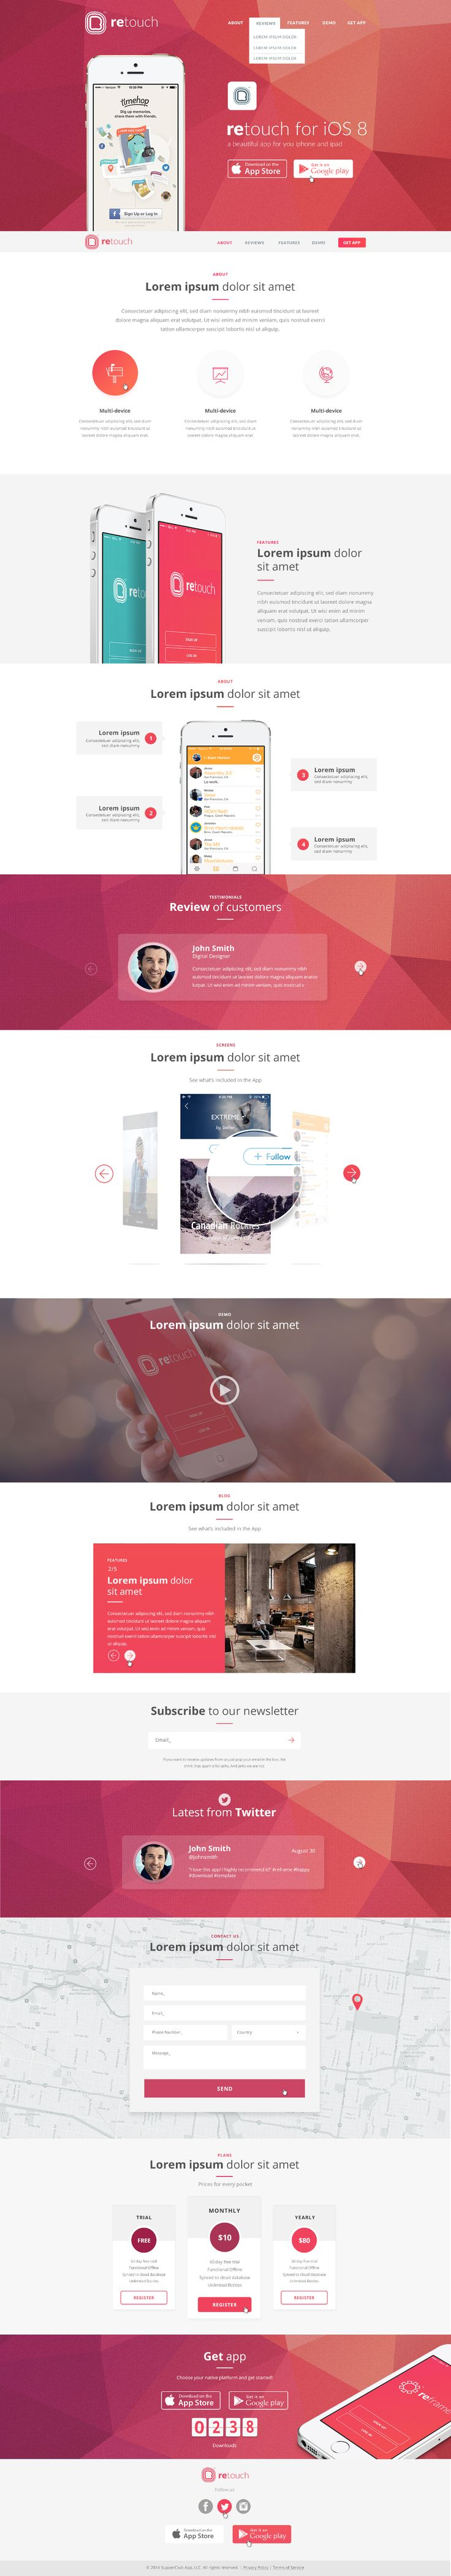 ReTouch - App WordPress Theme on Behance